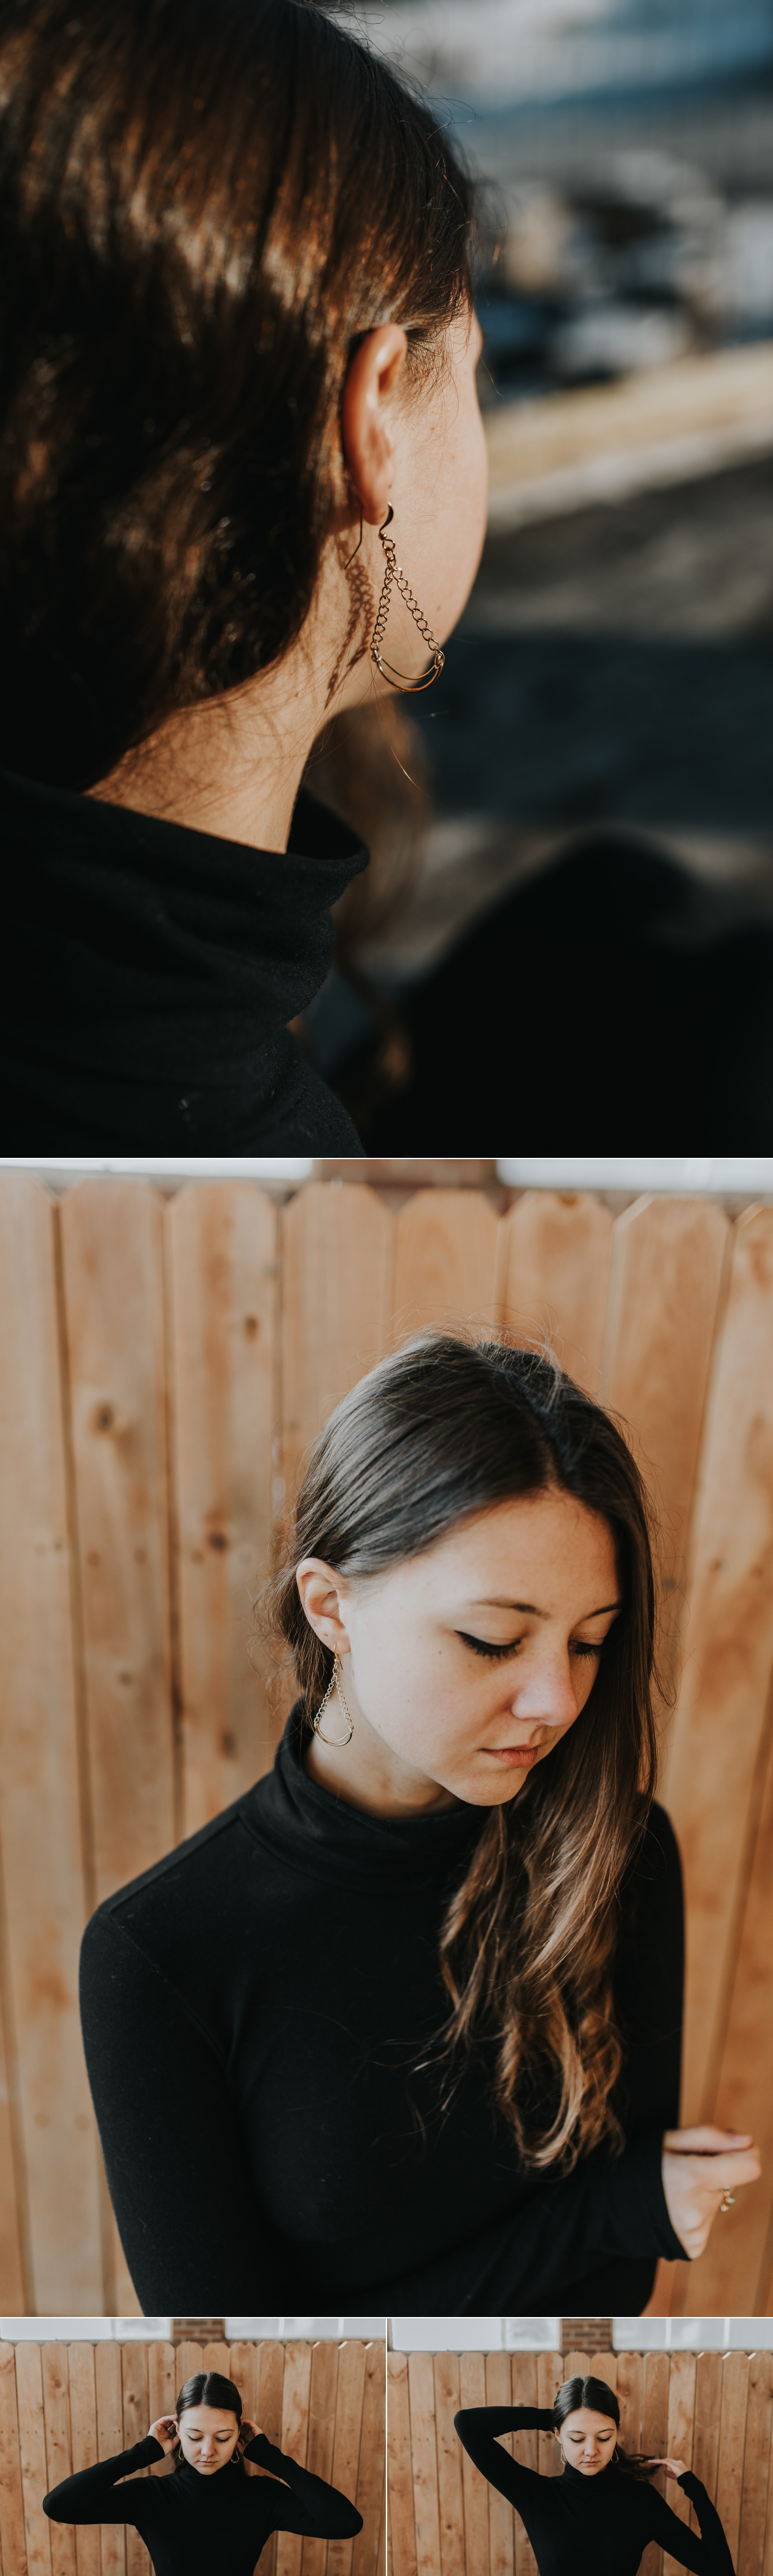 lupine jules minneapolis minnesota texas austin dallas houston wedding elopement destination intimate adventurous couple best photographer_0022.jpg